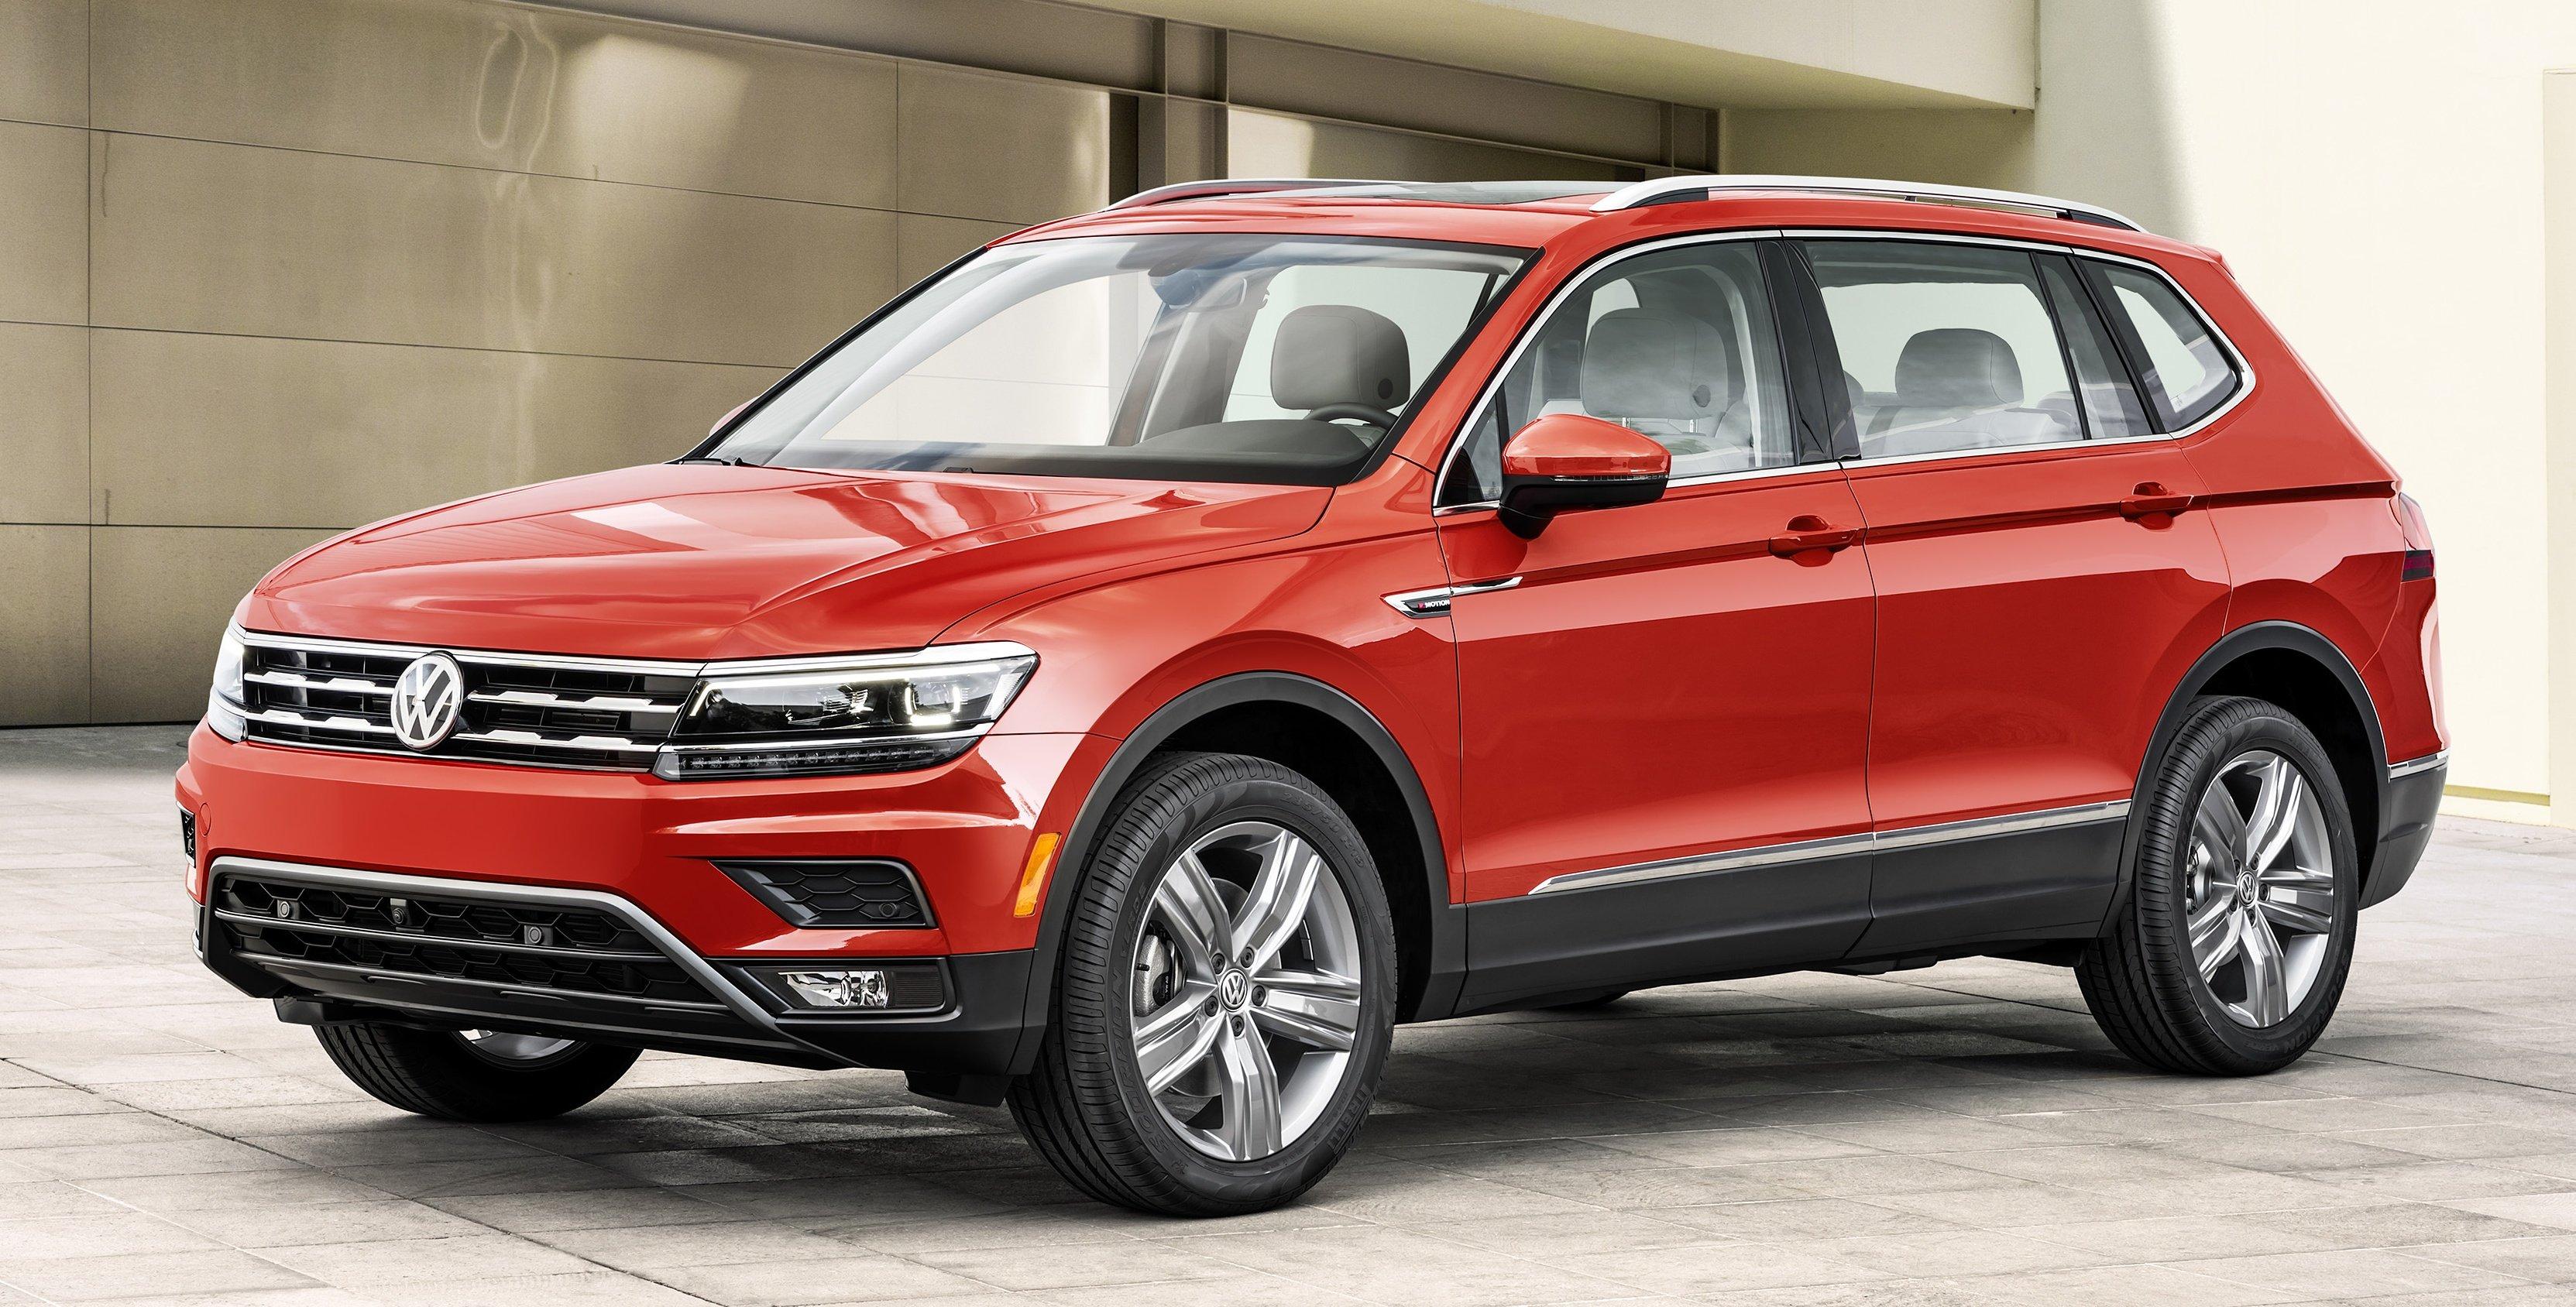 2018-VW-Tiguan-Allspace-03-e1483934542344.jpg